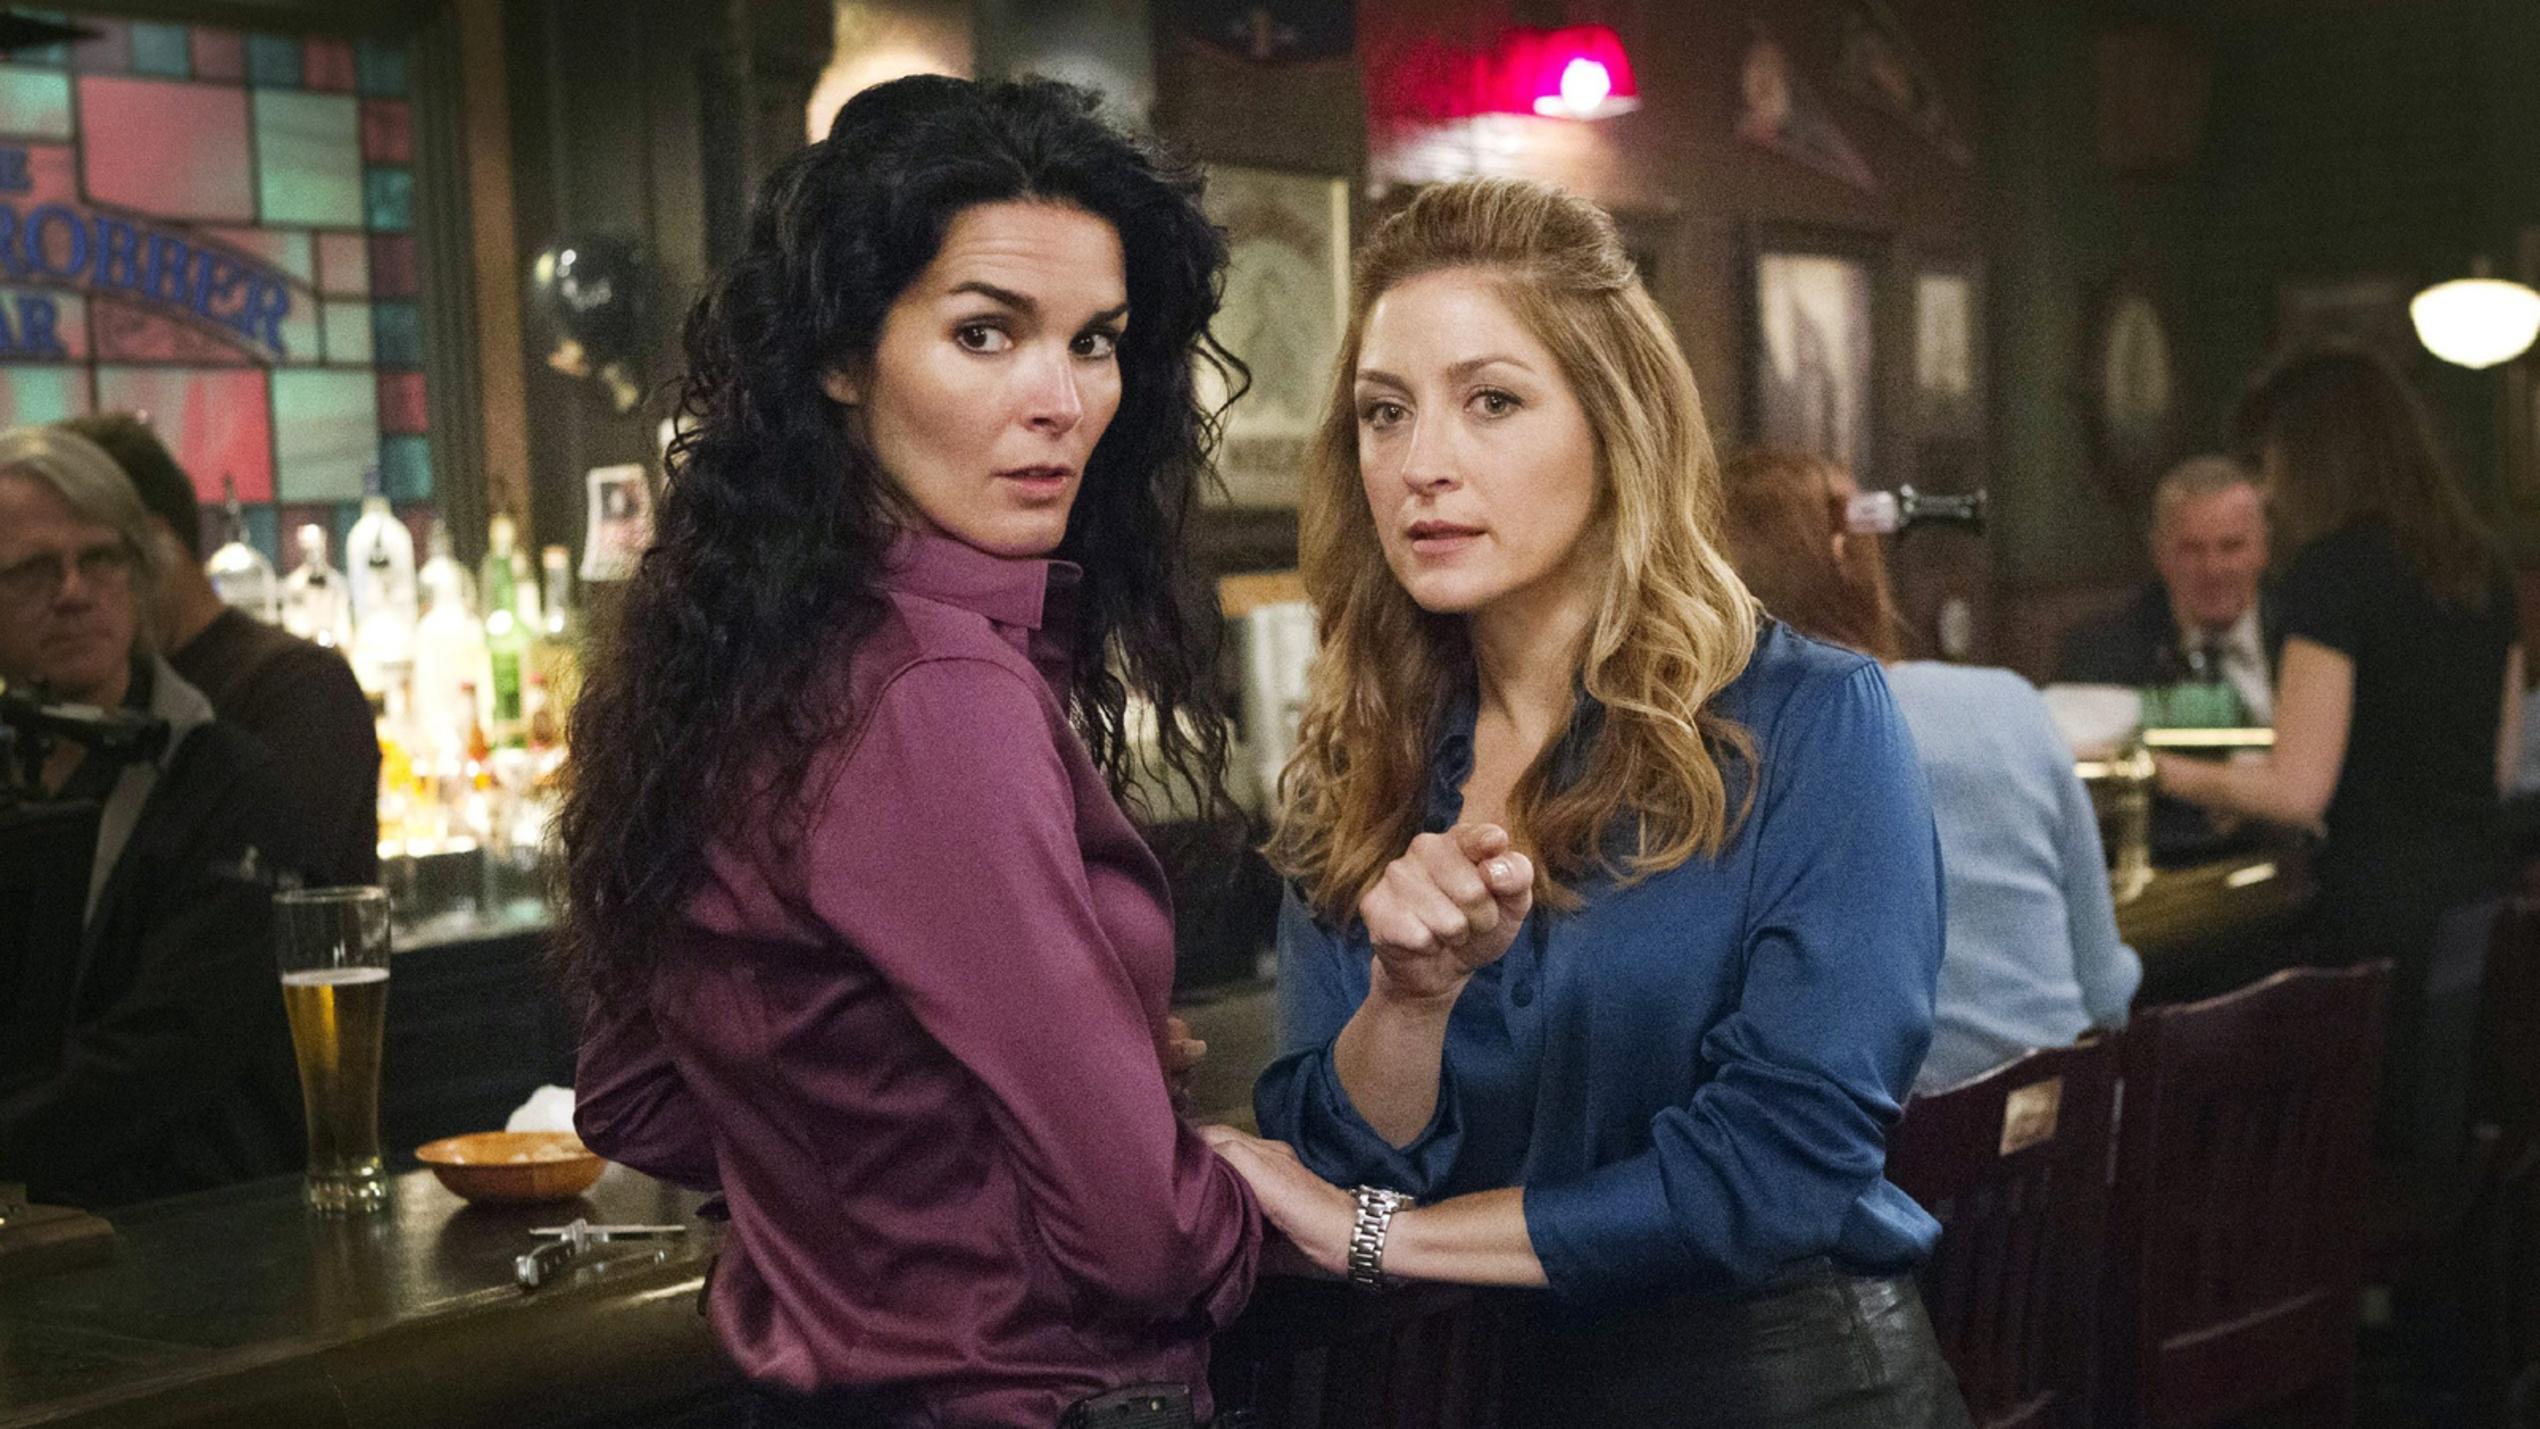 Rizzoli Isles Staffel 7 Feiert Ihre Free Tv Premiere Ab 22 Februar